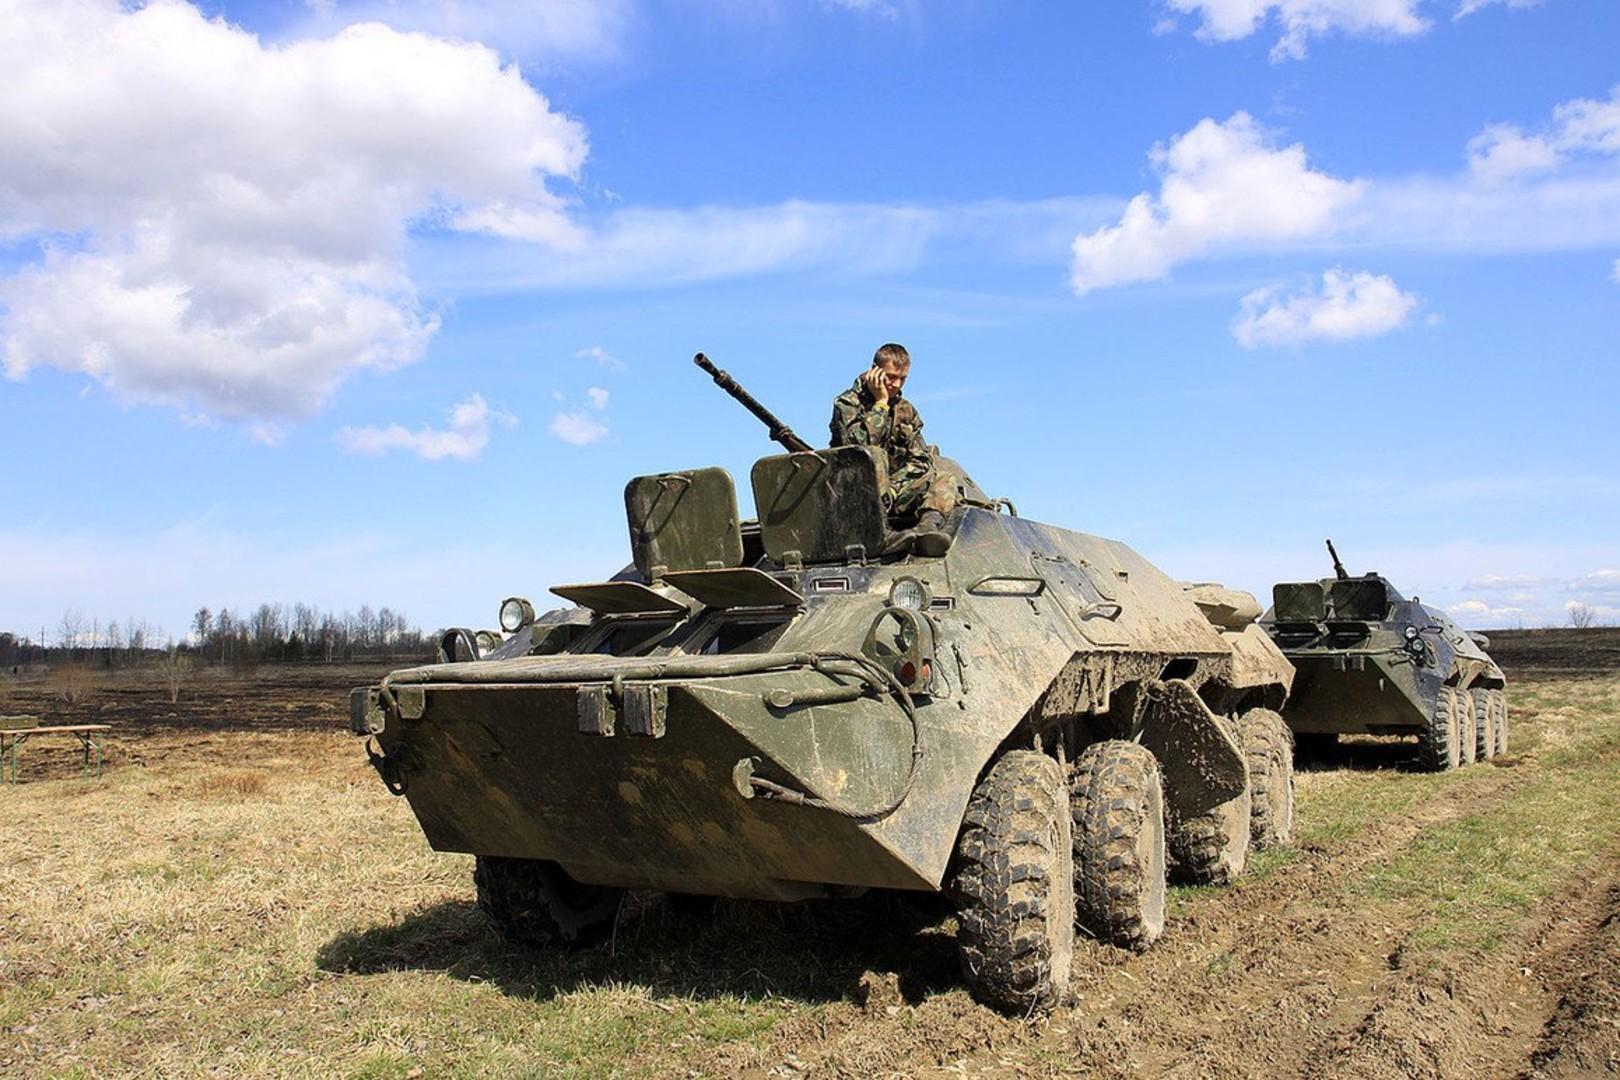 militarystyle12.jpg